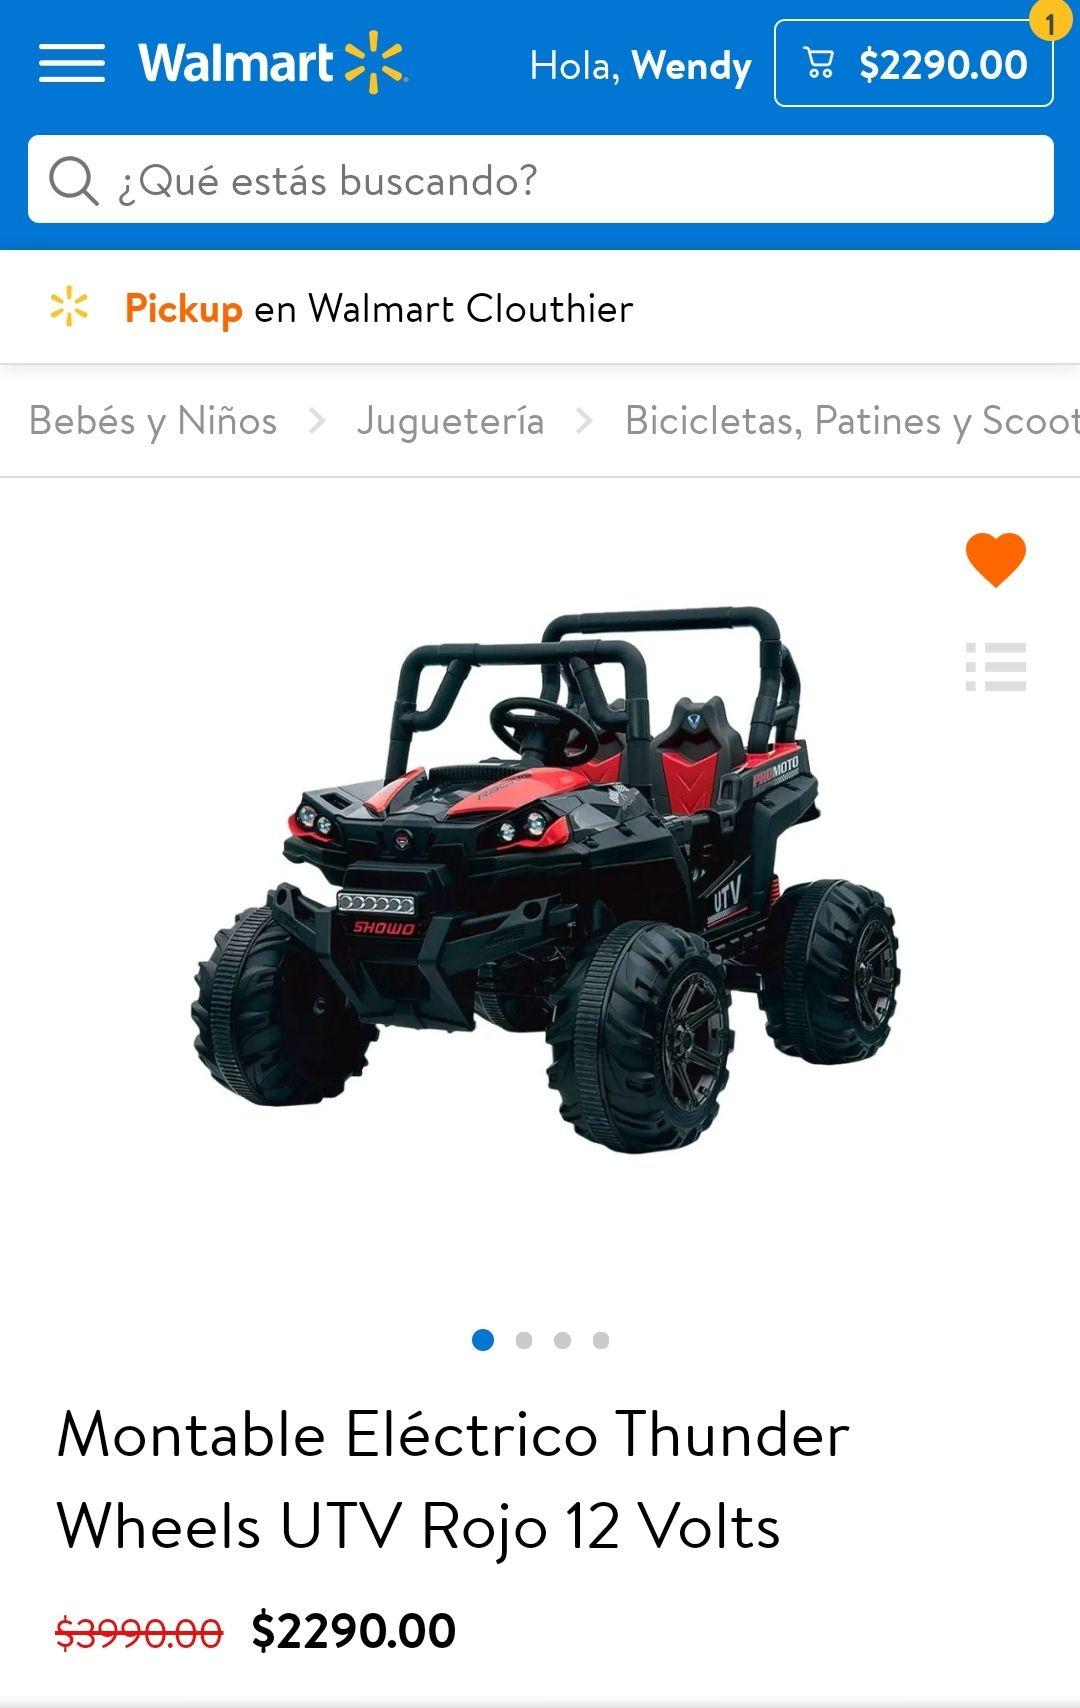 Walmart súper en línea: Montable Eléctrico Thunder Wheels UTV Rojo 12 Volts